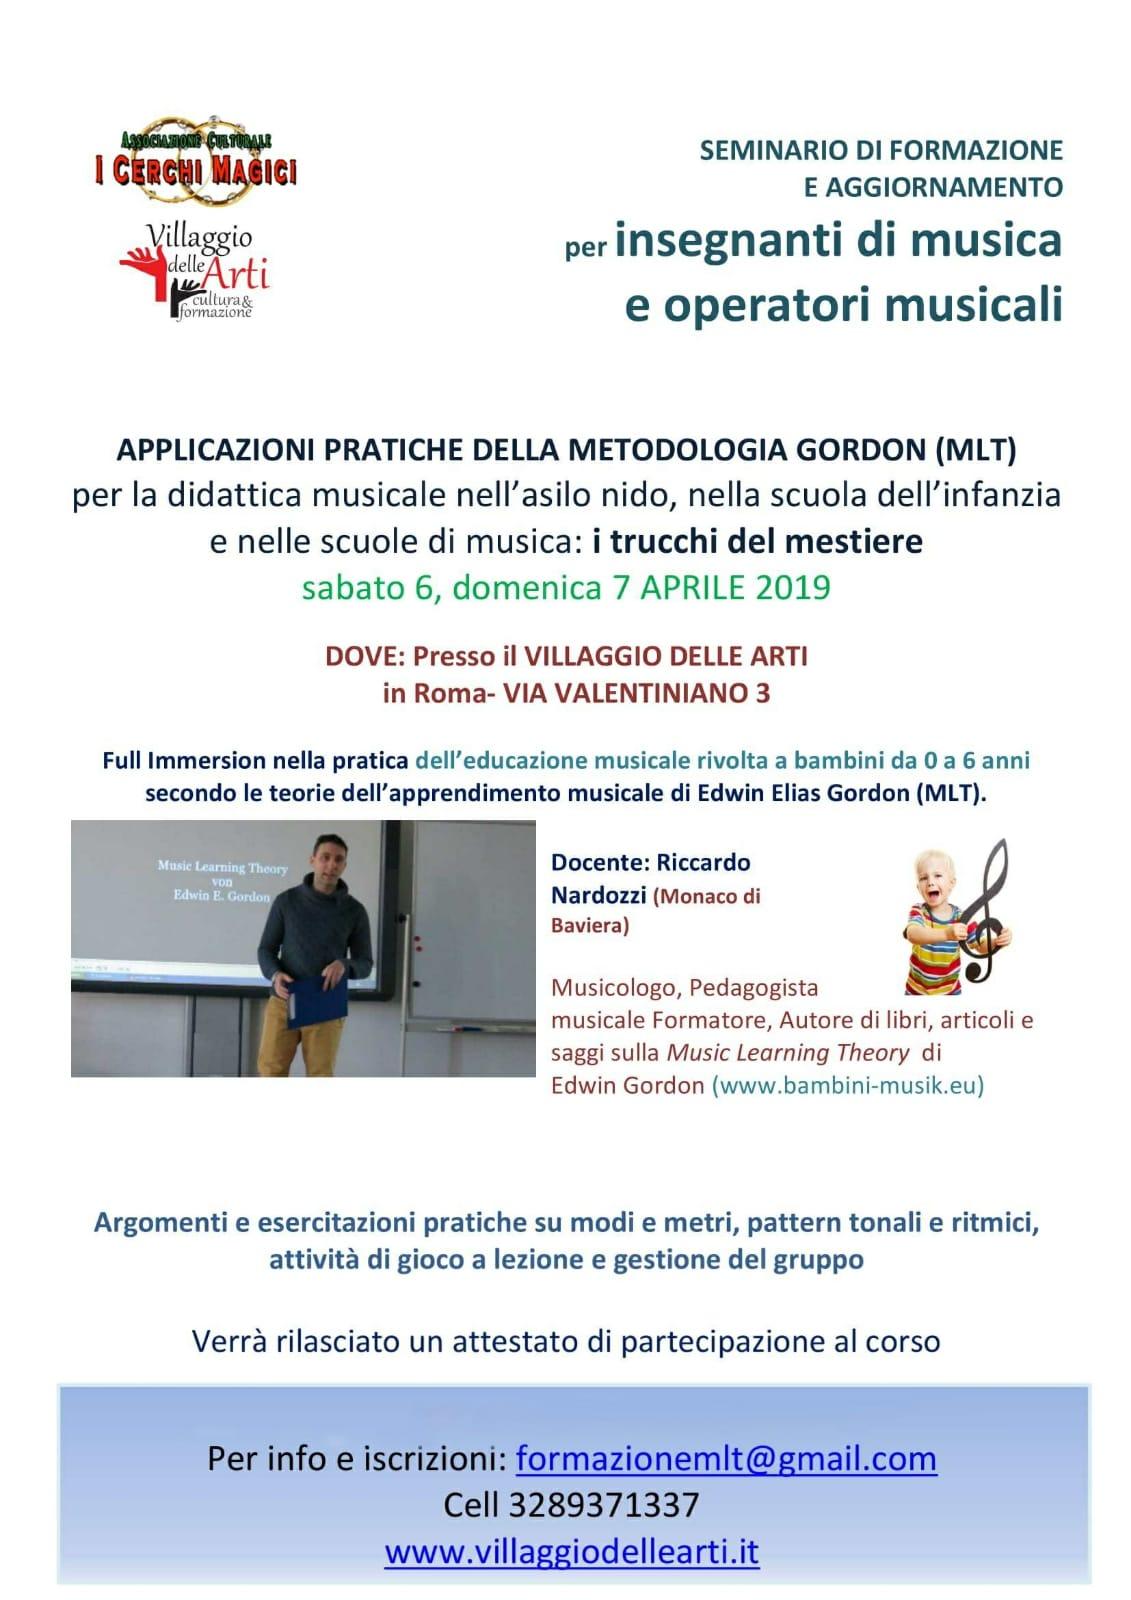 SEMINARIO GORDON MUSICISTI